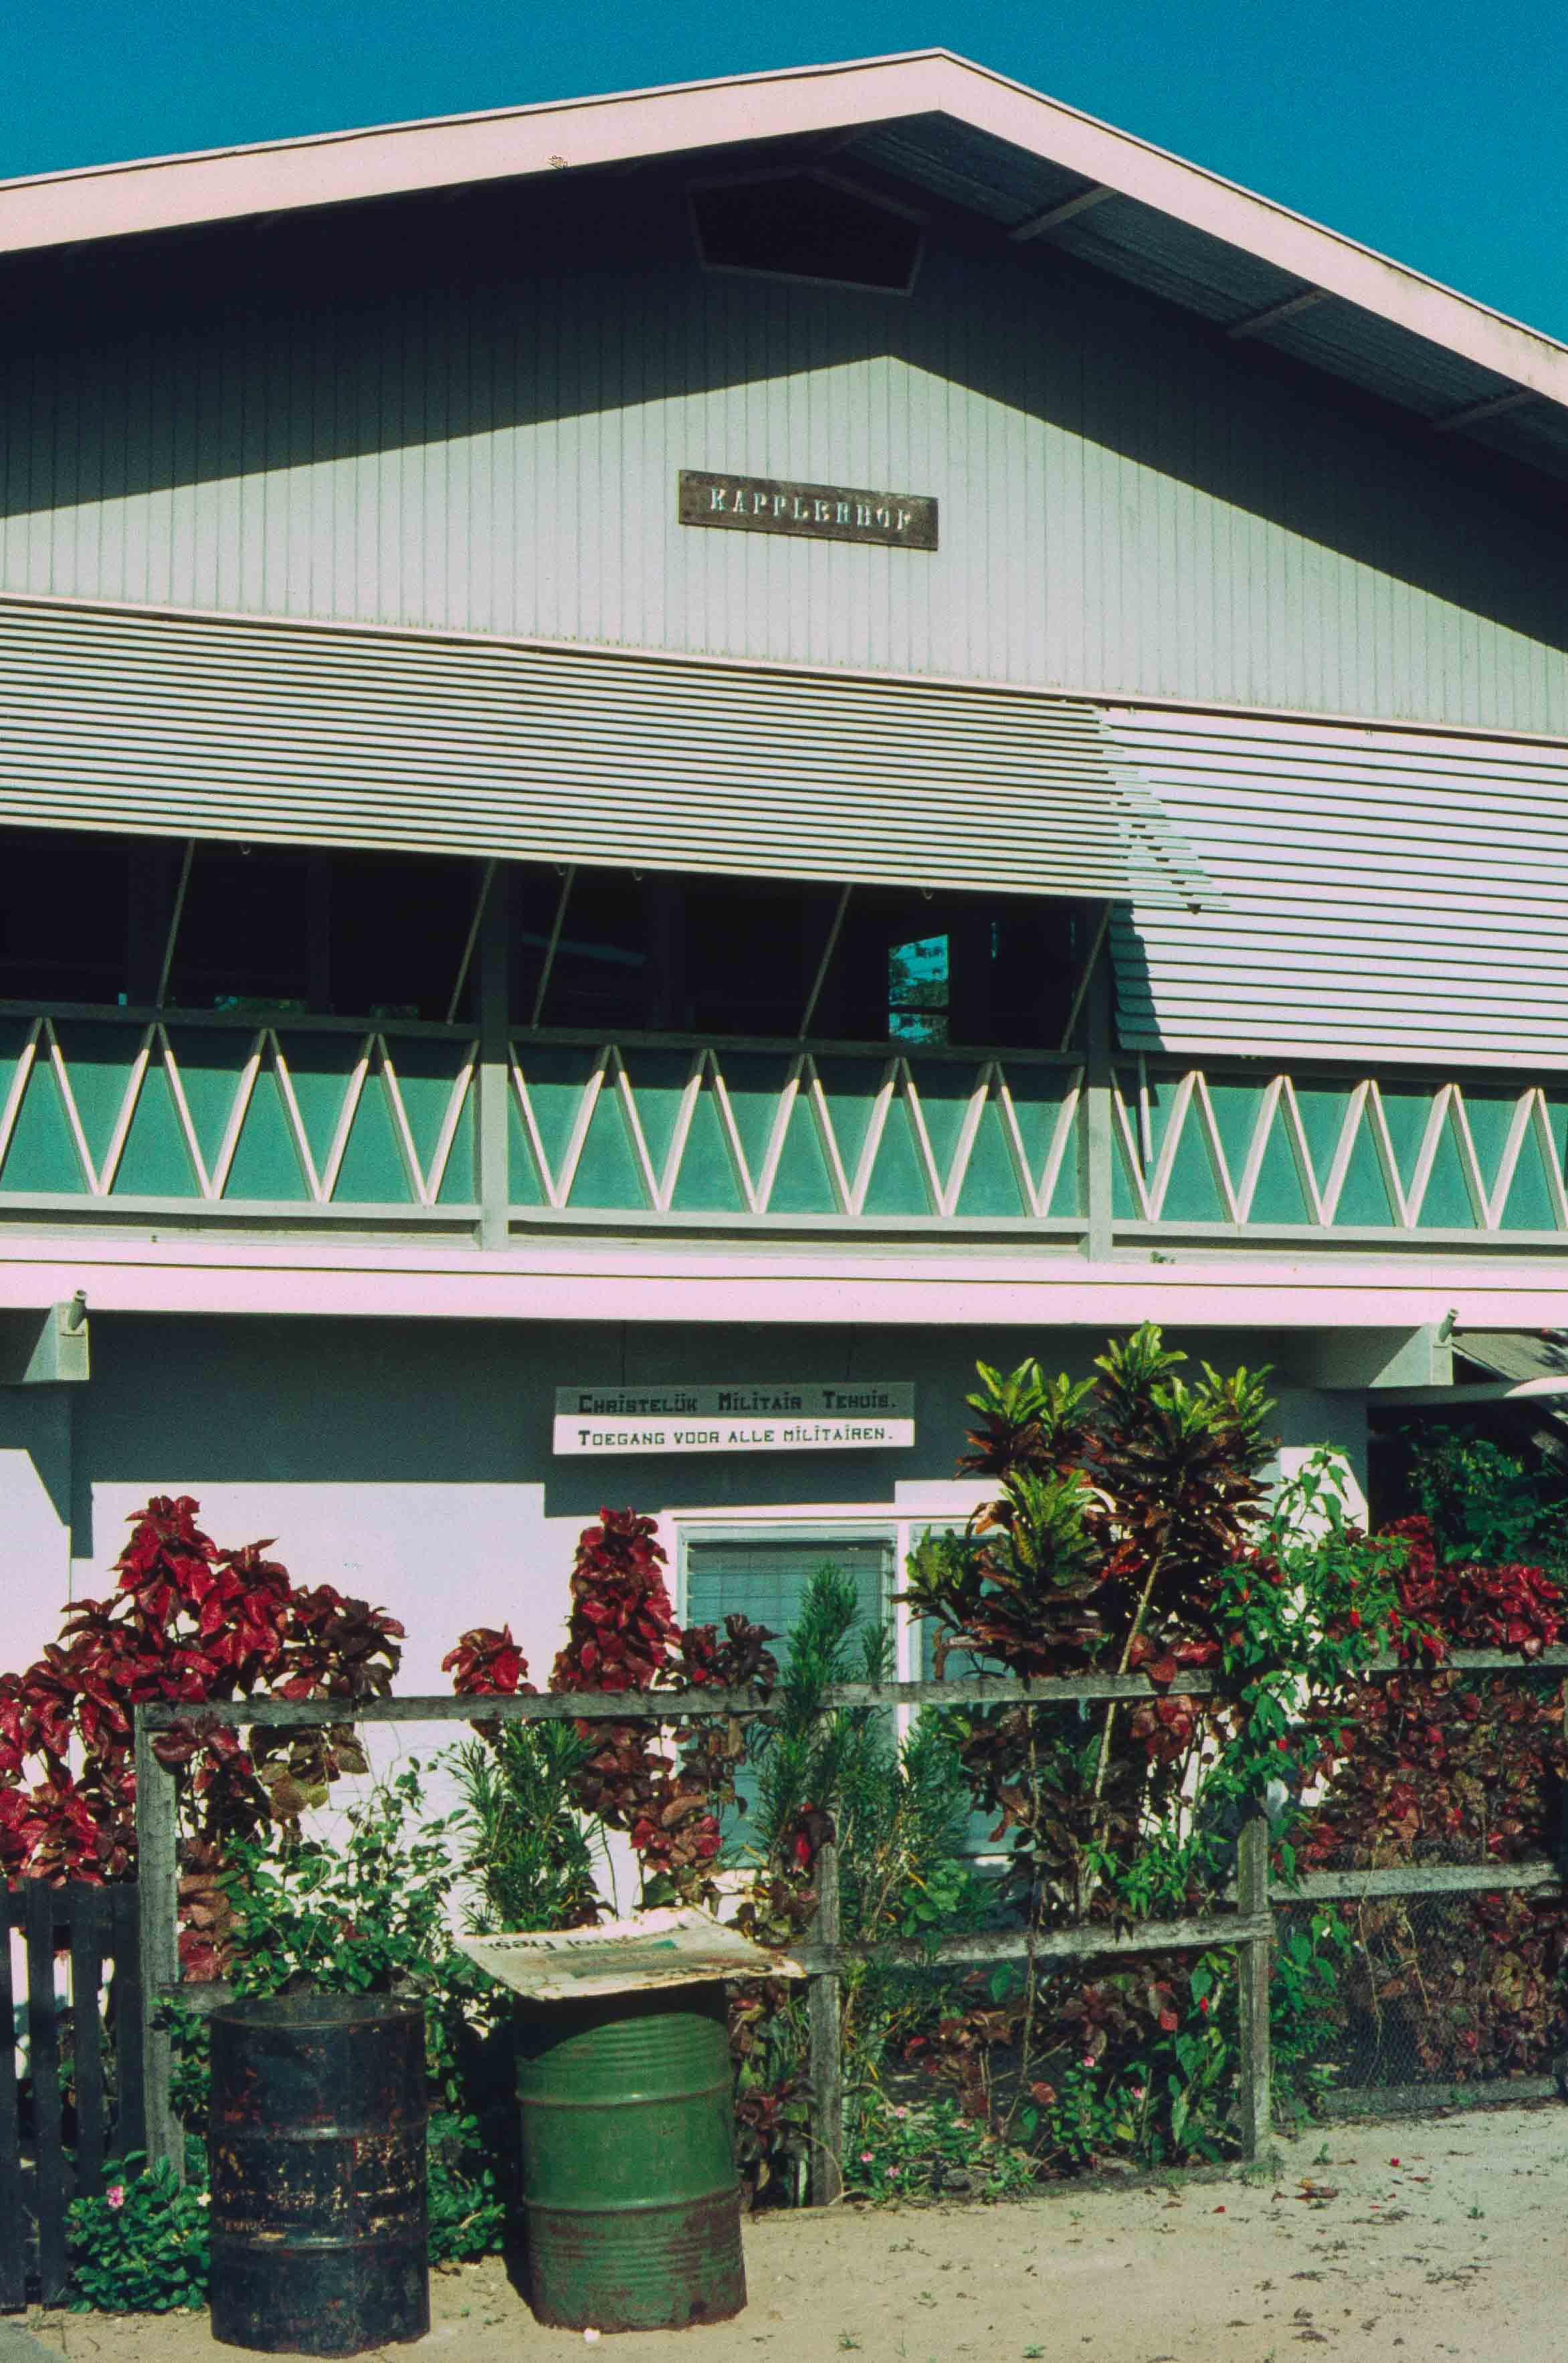 392. Suriname